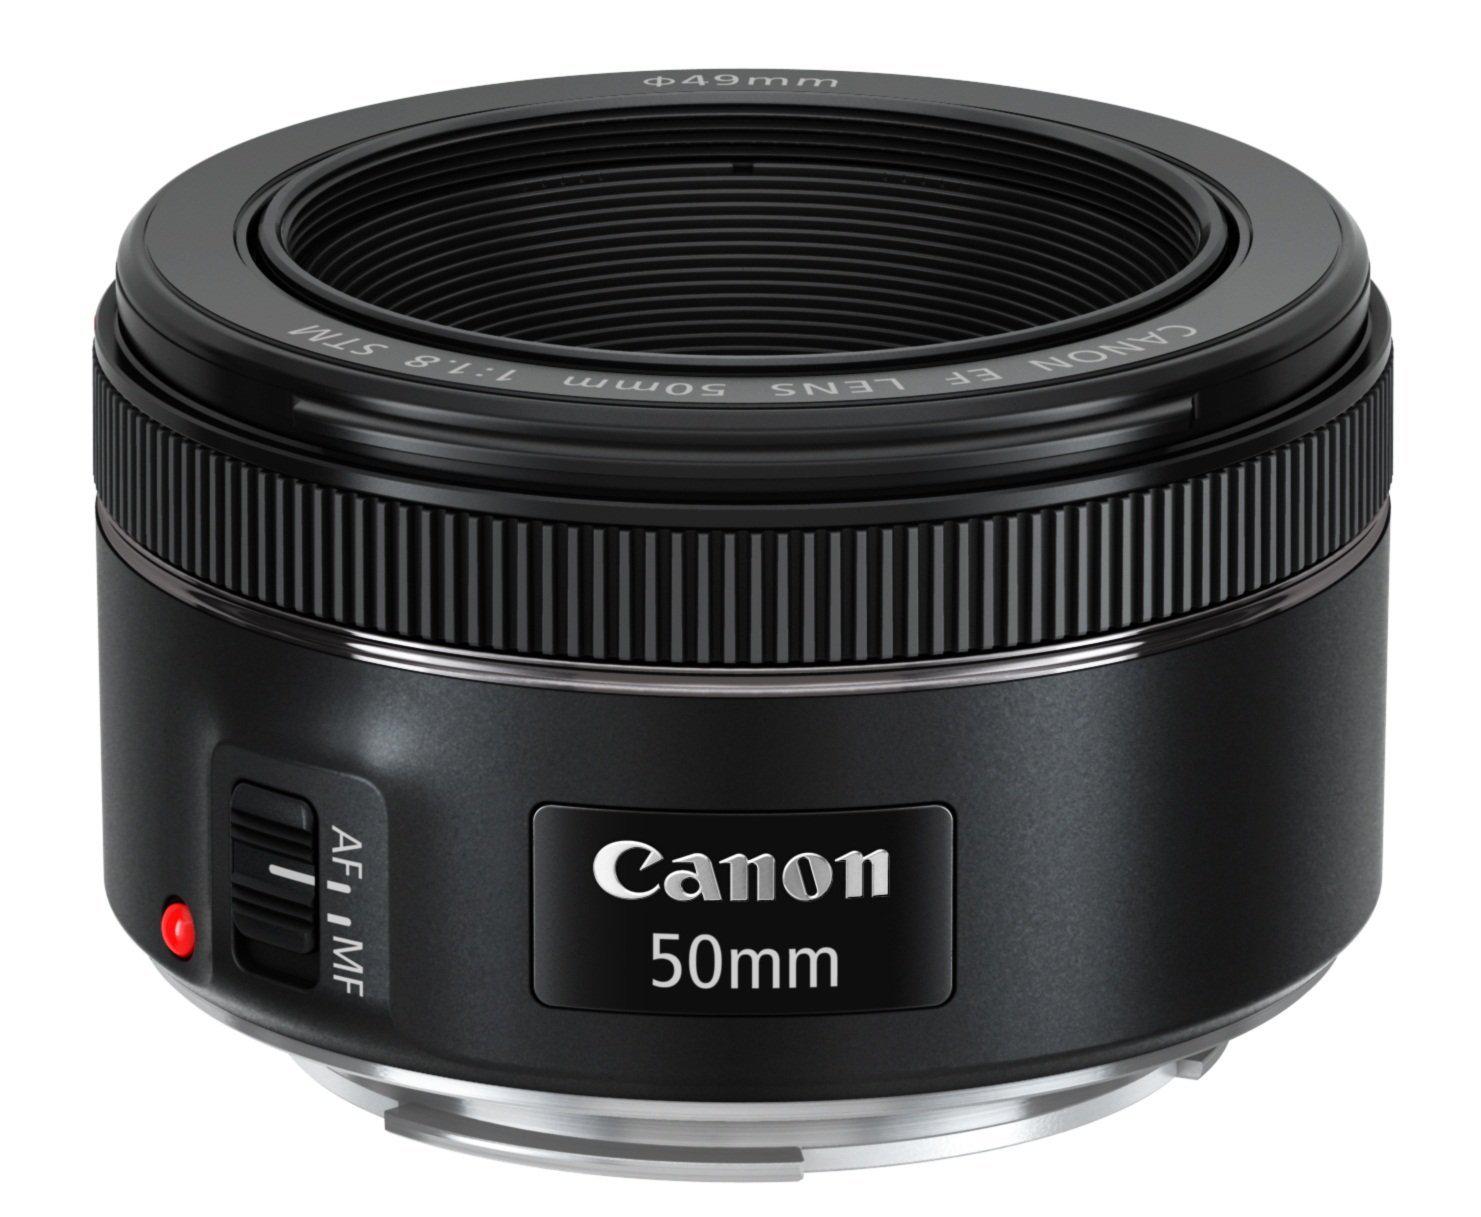 [Précommande] Objectif Canon EF 50mm STM f/1.8